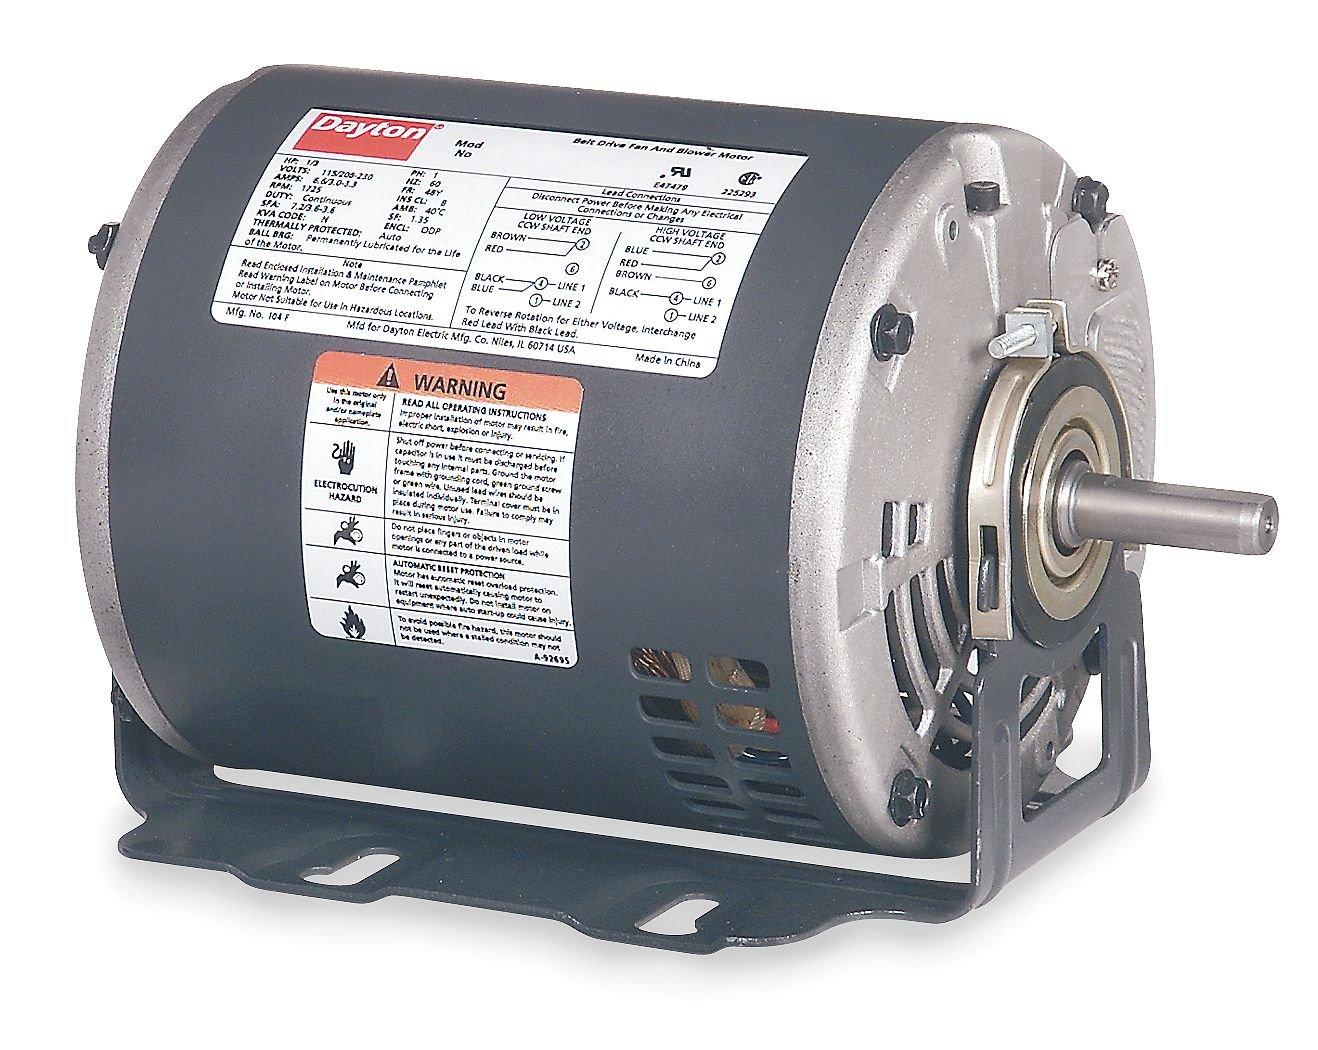 Dayton 3K384 Motor, 1/3 HP, 60hz, Belt